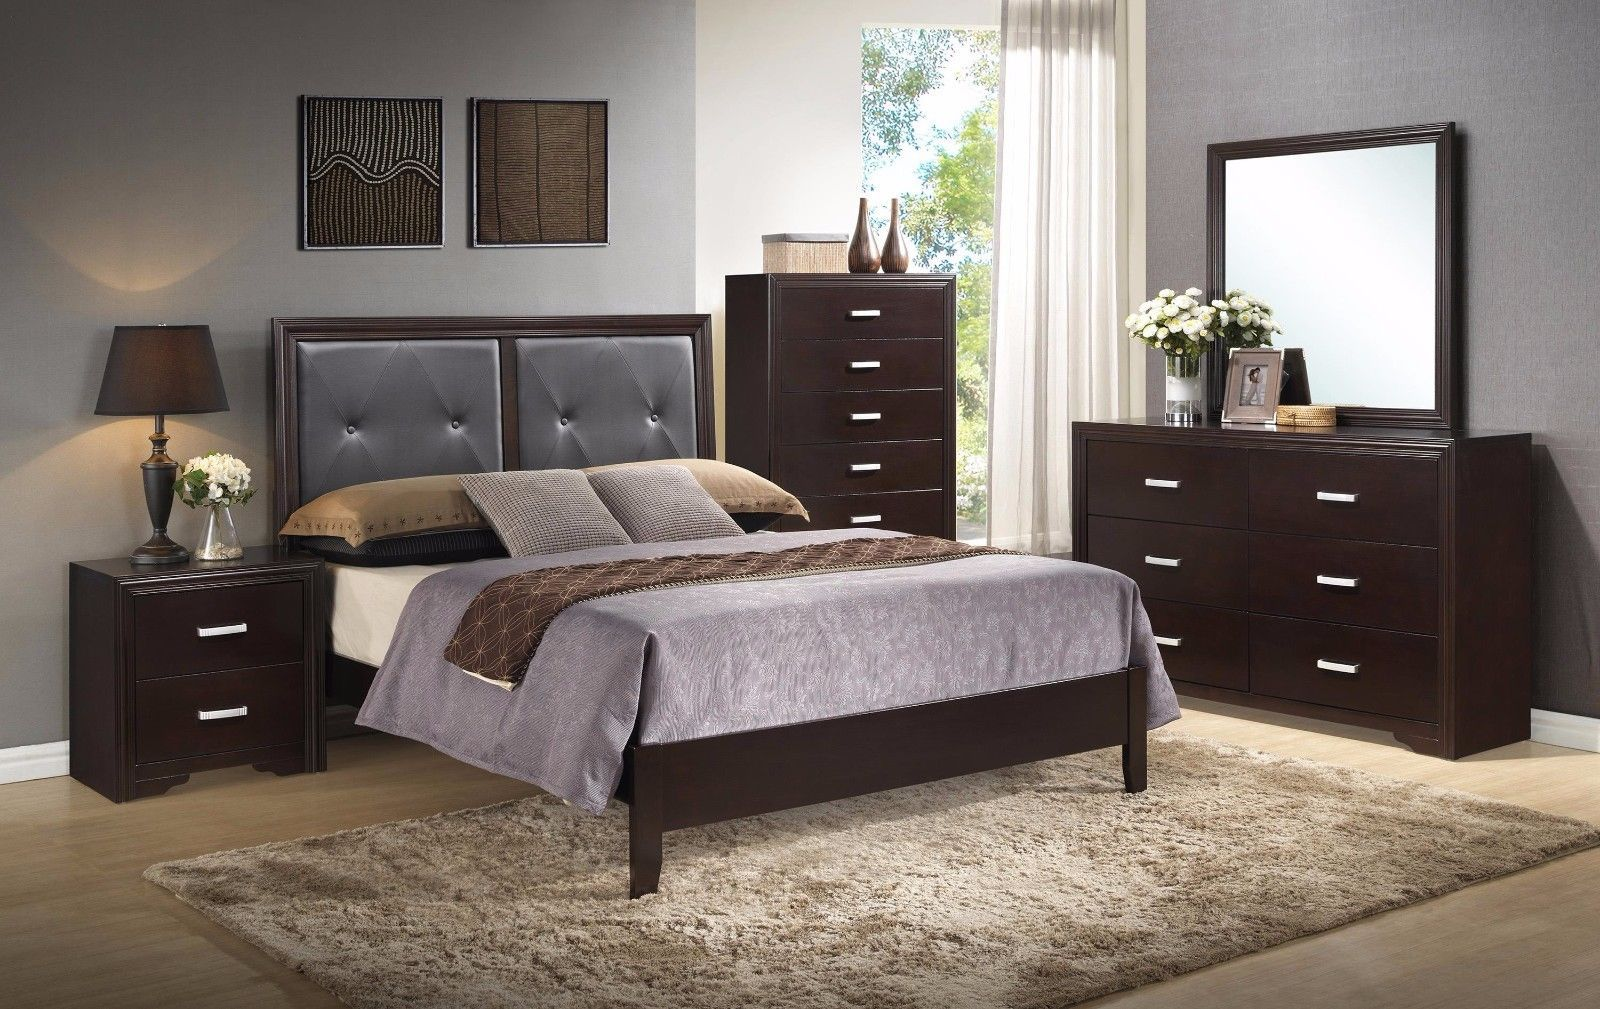 Crown Mark RB5300 Elijah King Size Bedroom Set 5pc. Brown Transitional Style